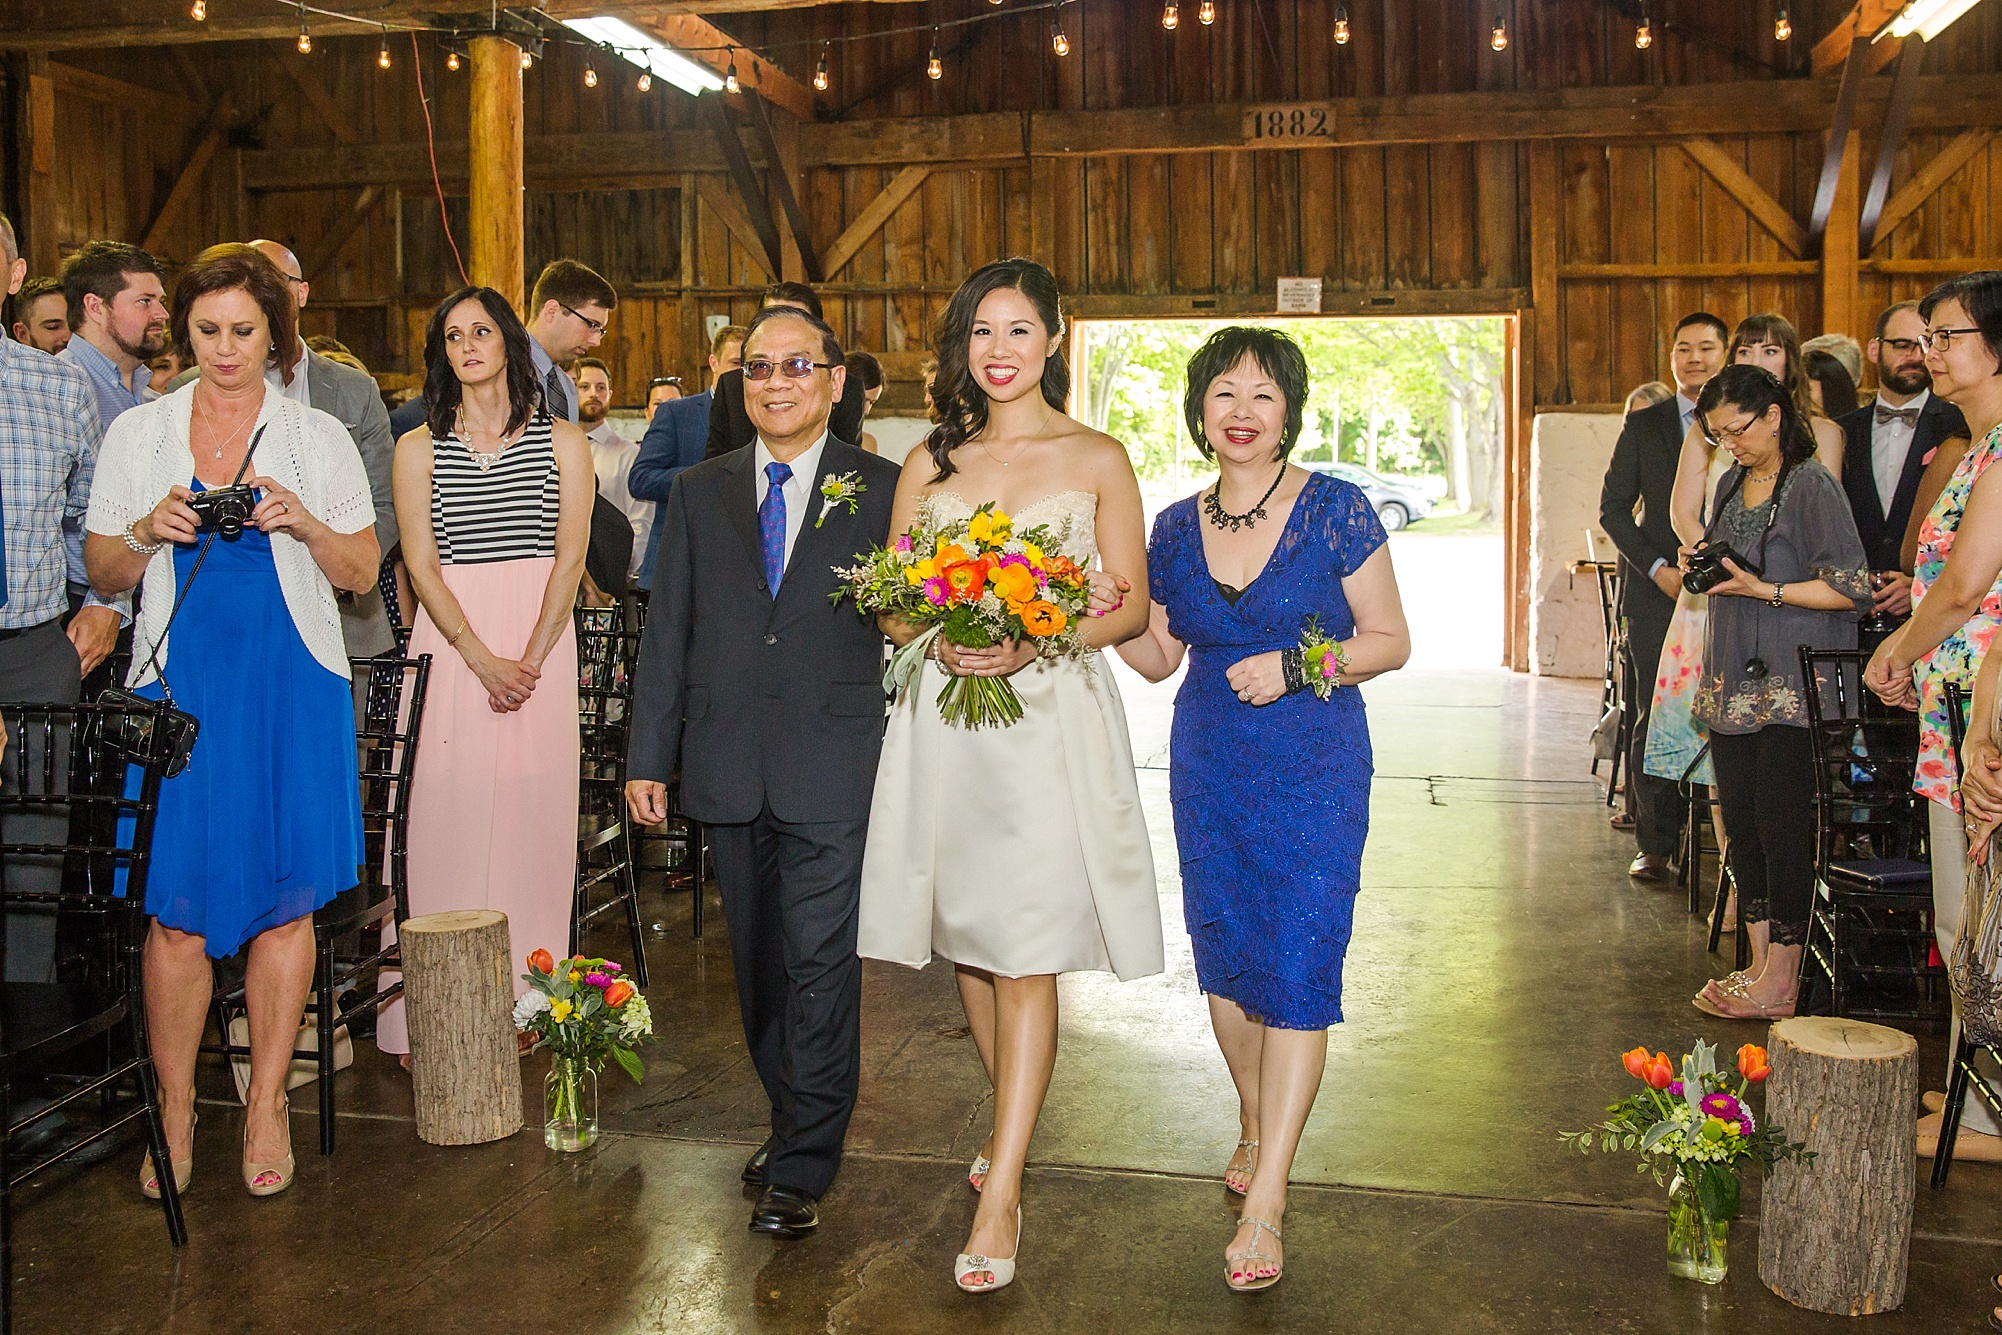 ballsfalls-wedding-photography_0053.jpg